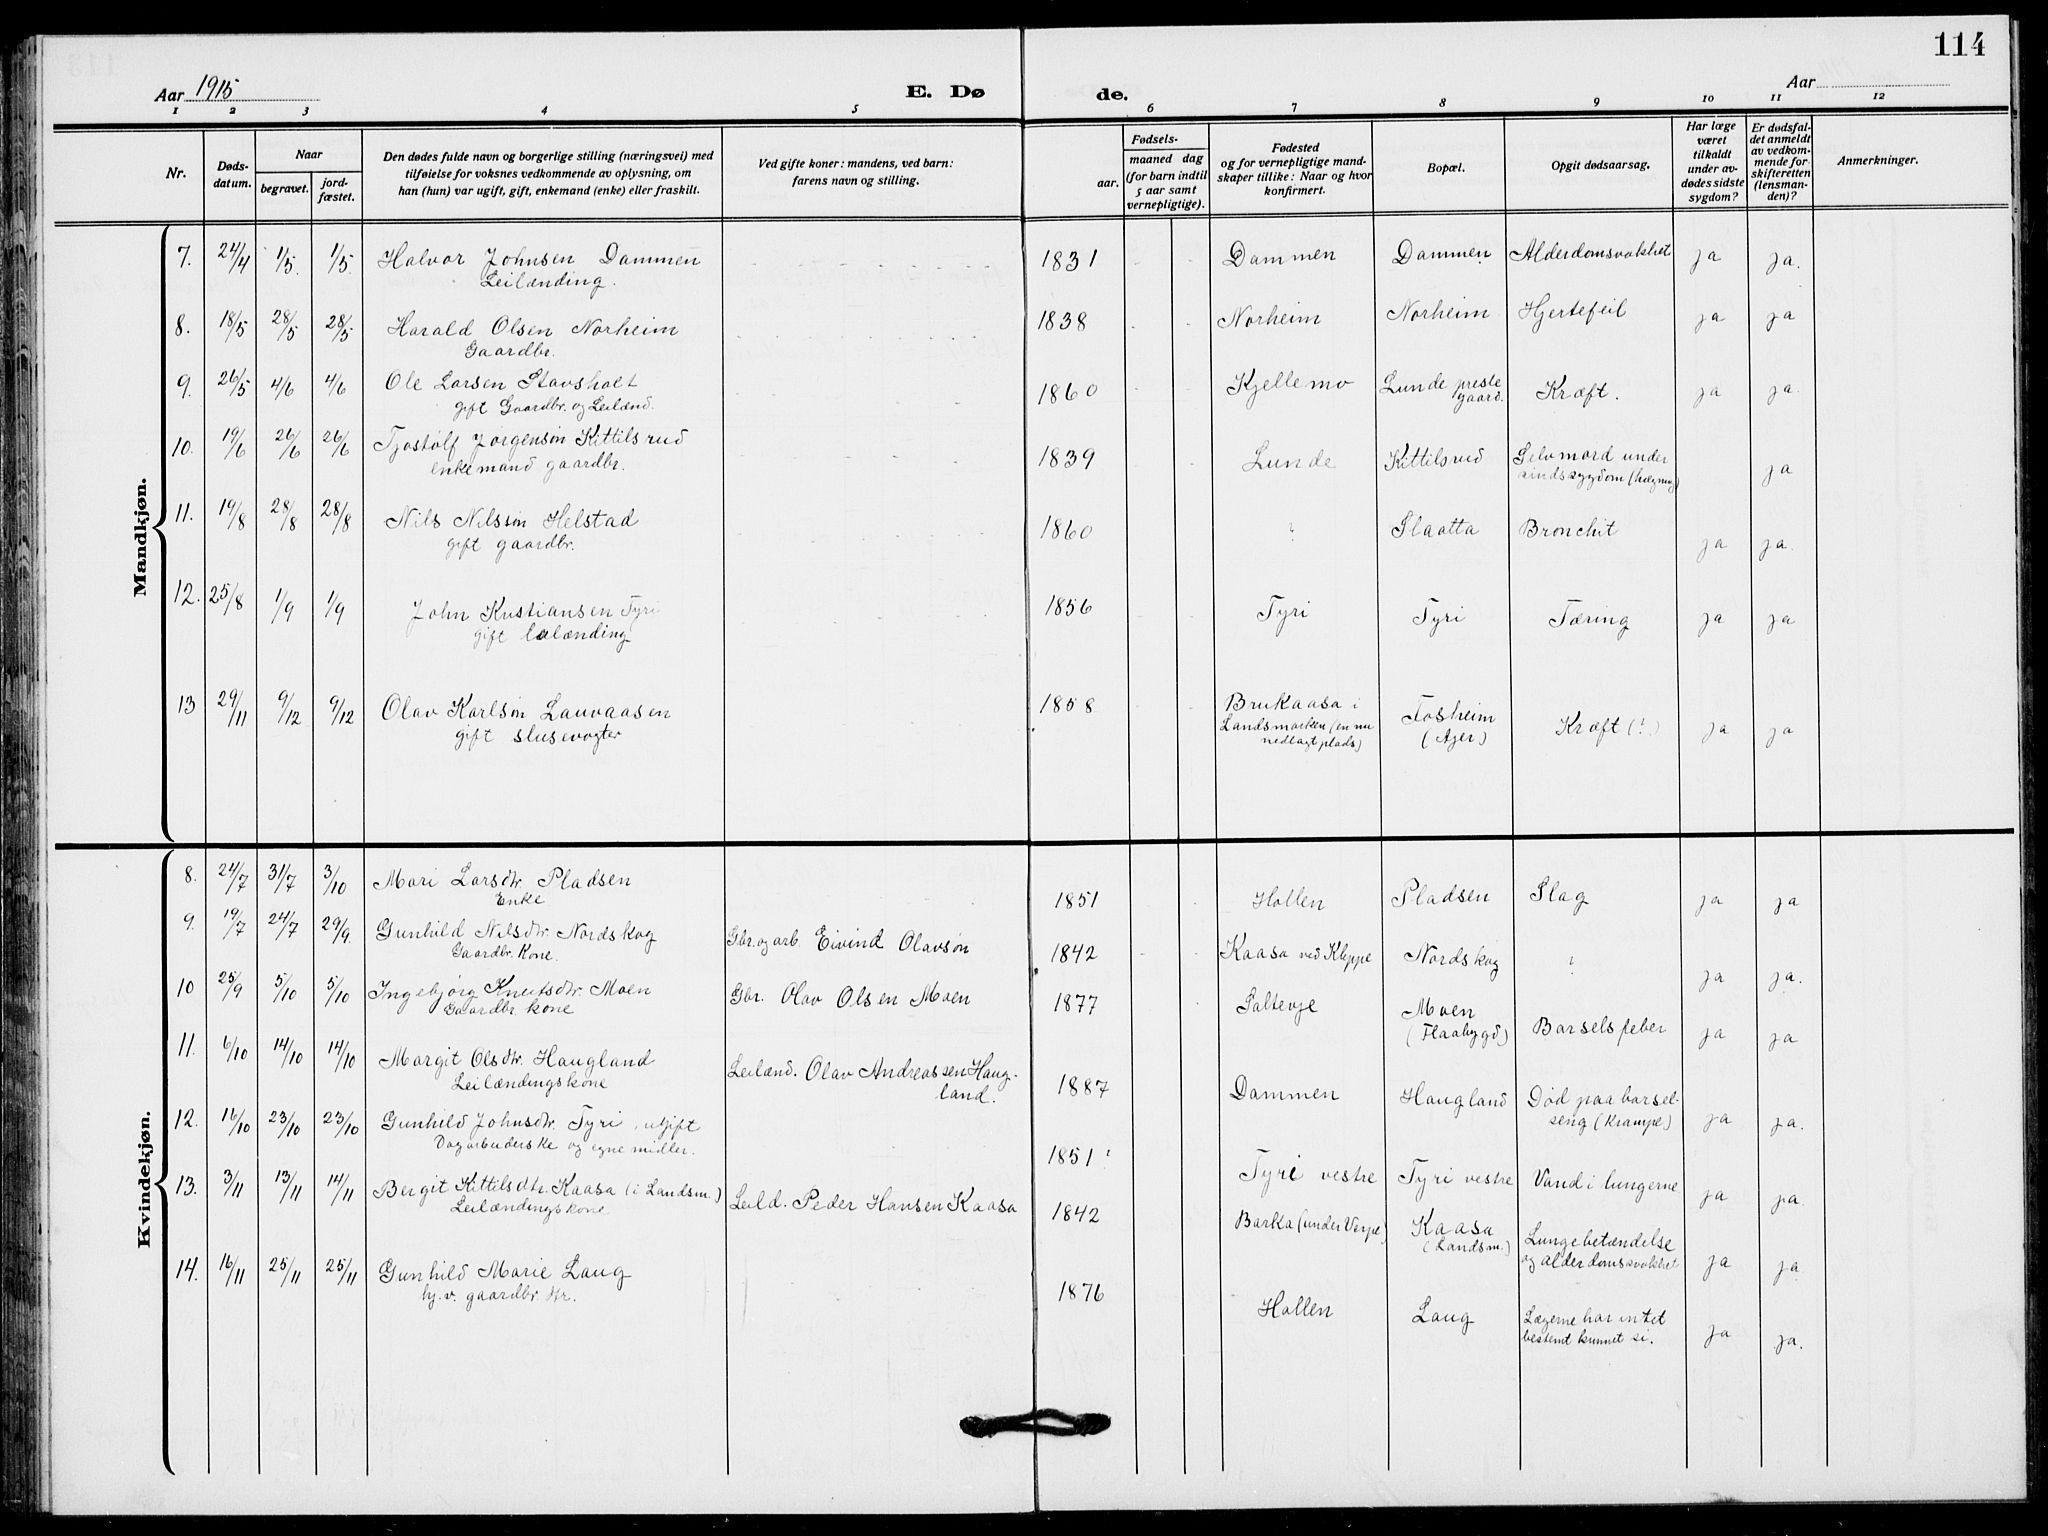 SAKO, Lunde kirkebøker, F/Fa/L0005: Ministerialbok nr. I 5, 1914-1922, s. 114